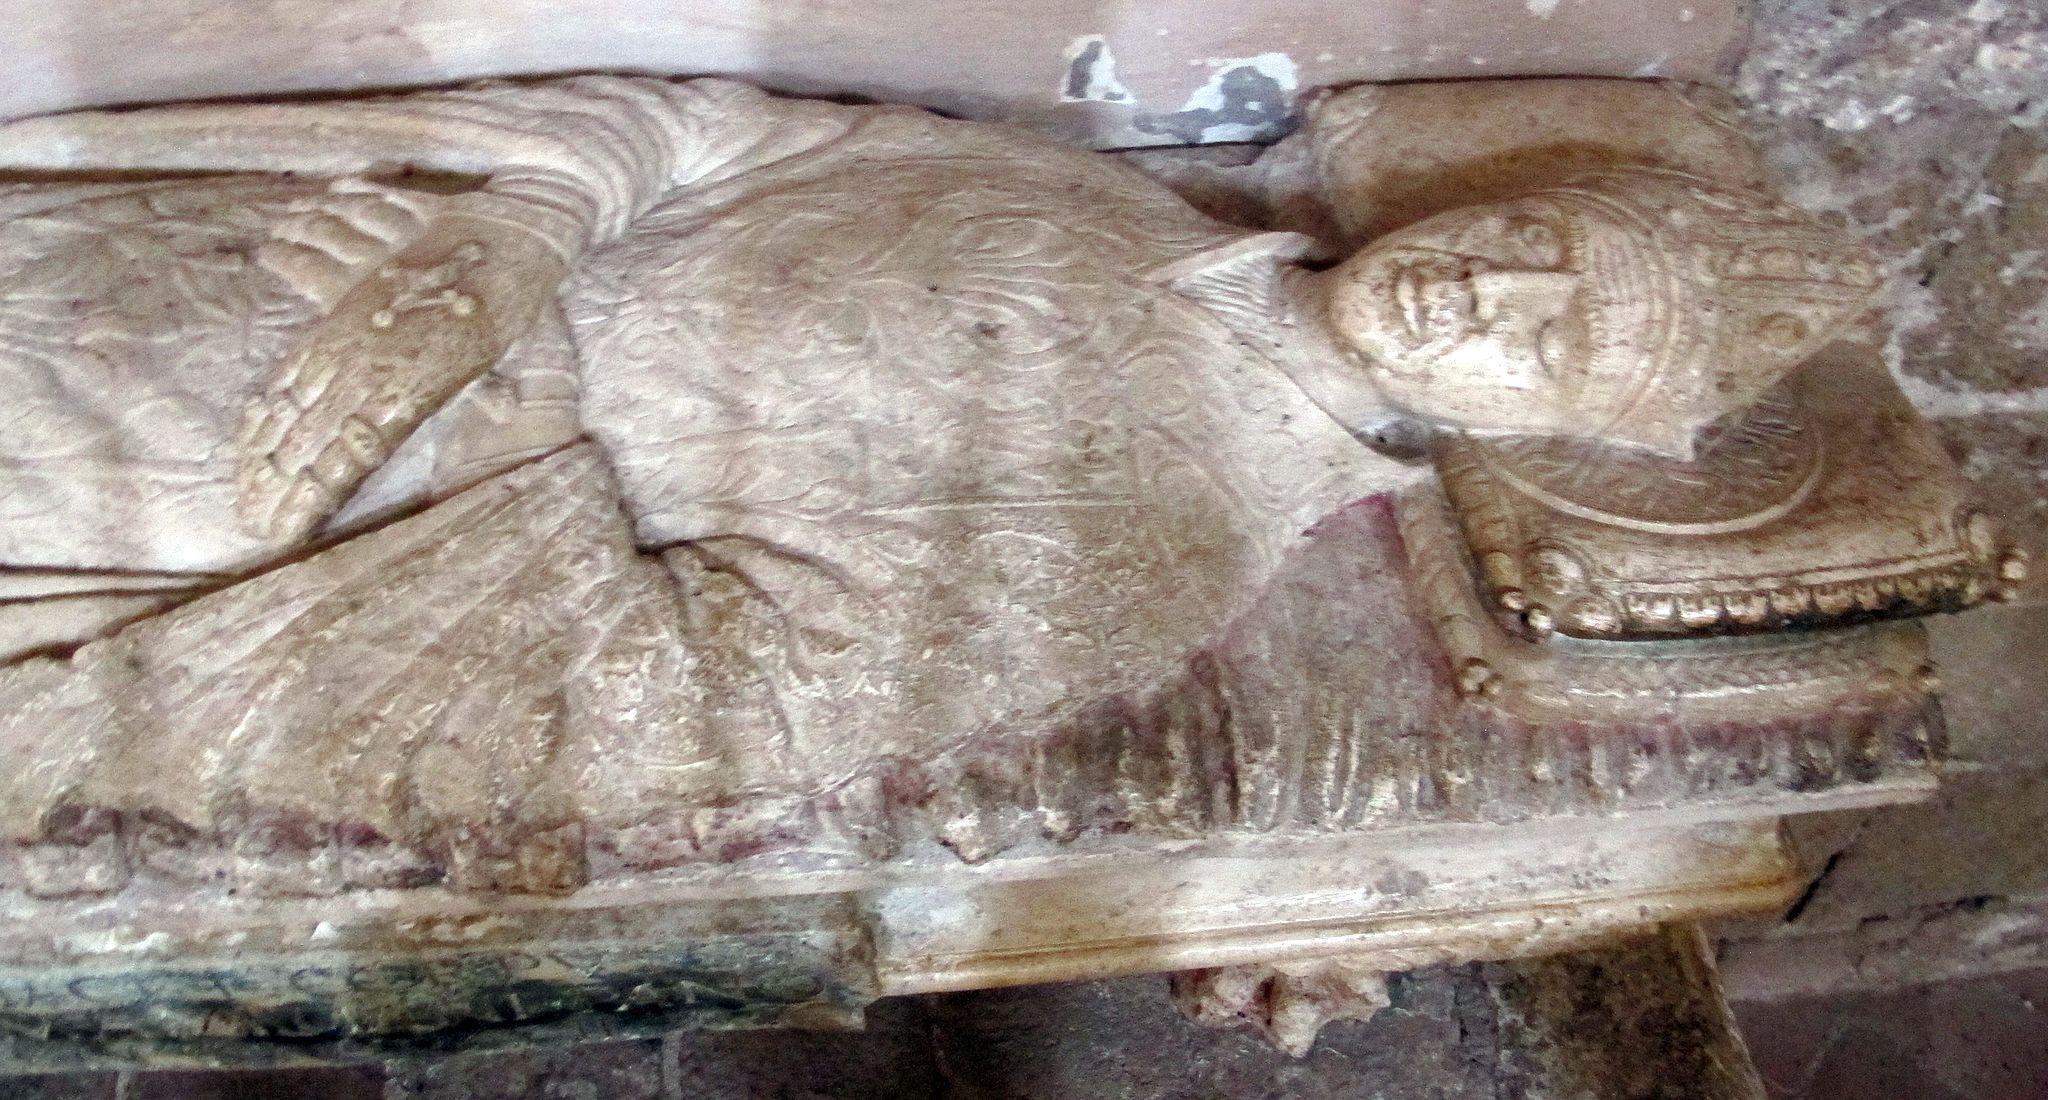 Il duomo di aIl duomo di Sovana, tomba di San Mamiliano vana, tomba di San Mamiliano